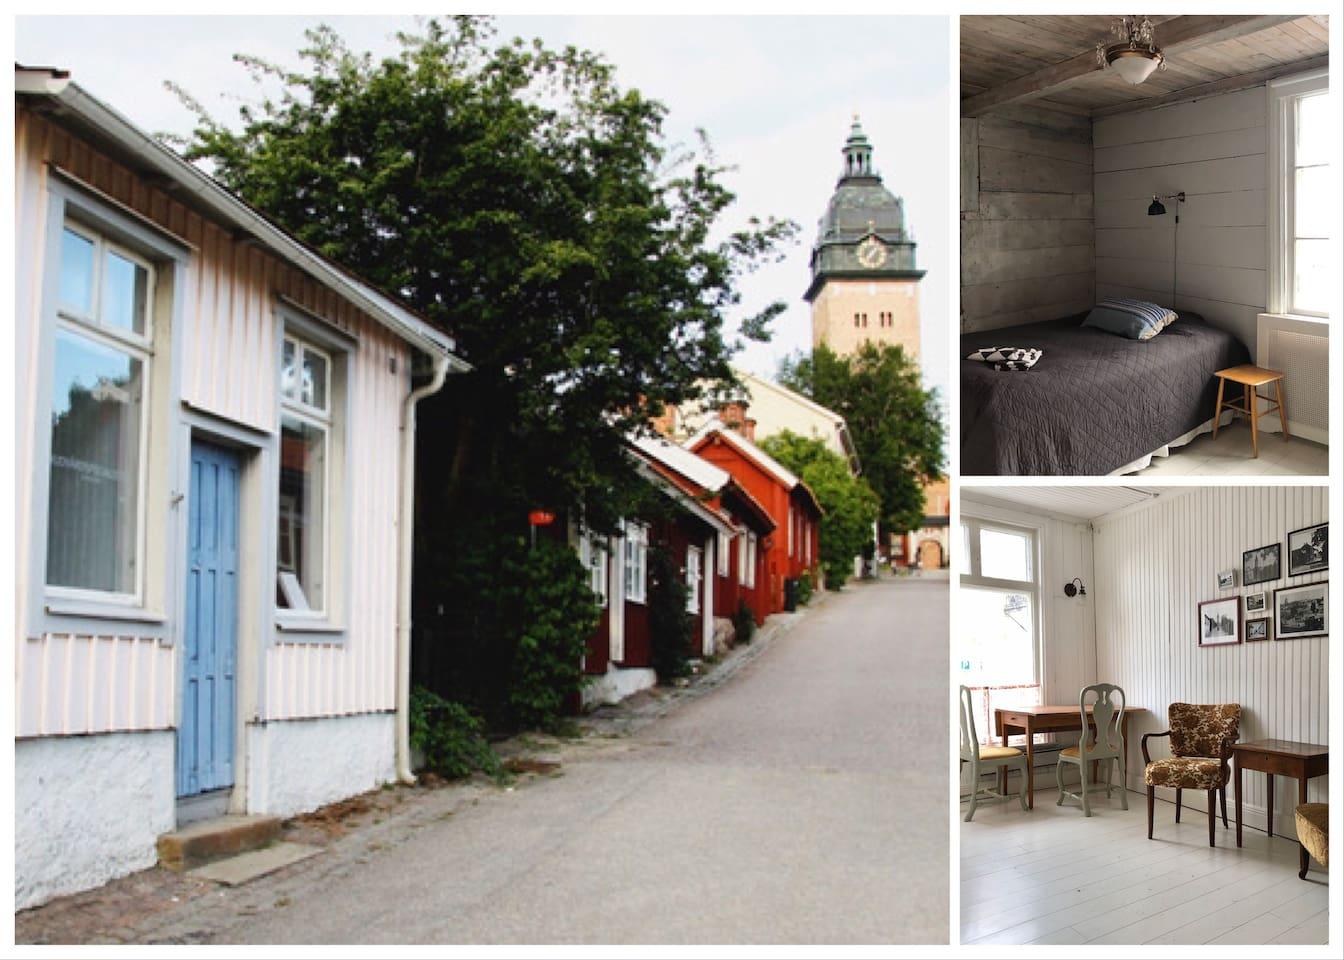 Gästhuset ligger på Gyllenhjelmsgatan, känt som Sveriges vackraste gata. Ingång blå dörren.